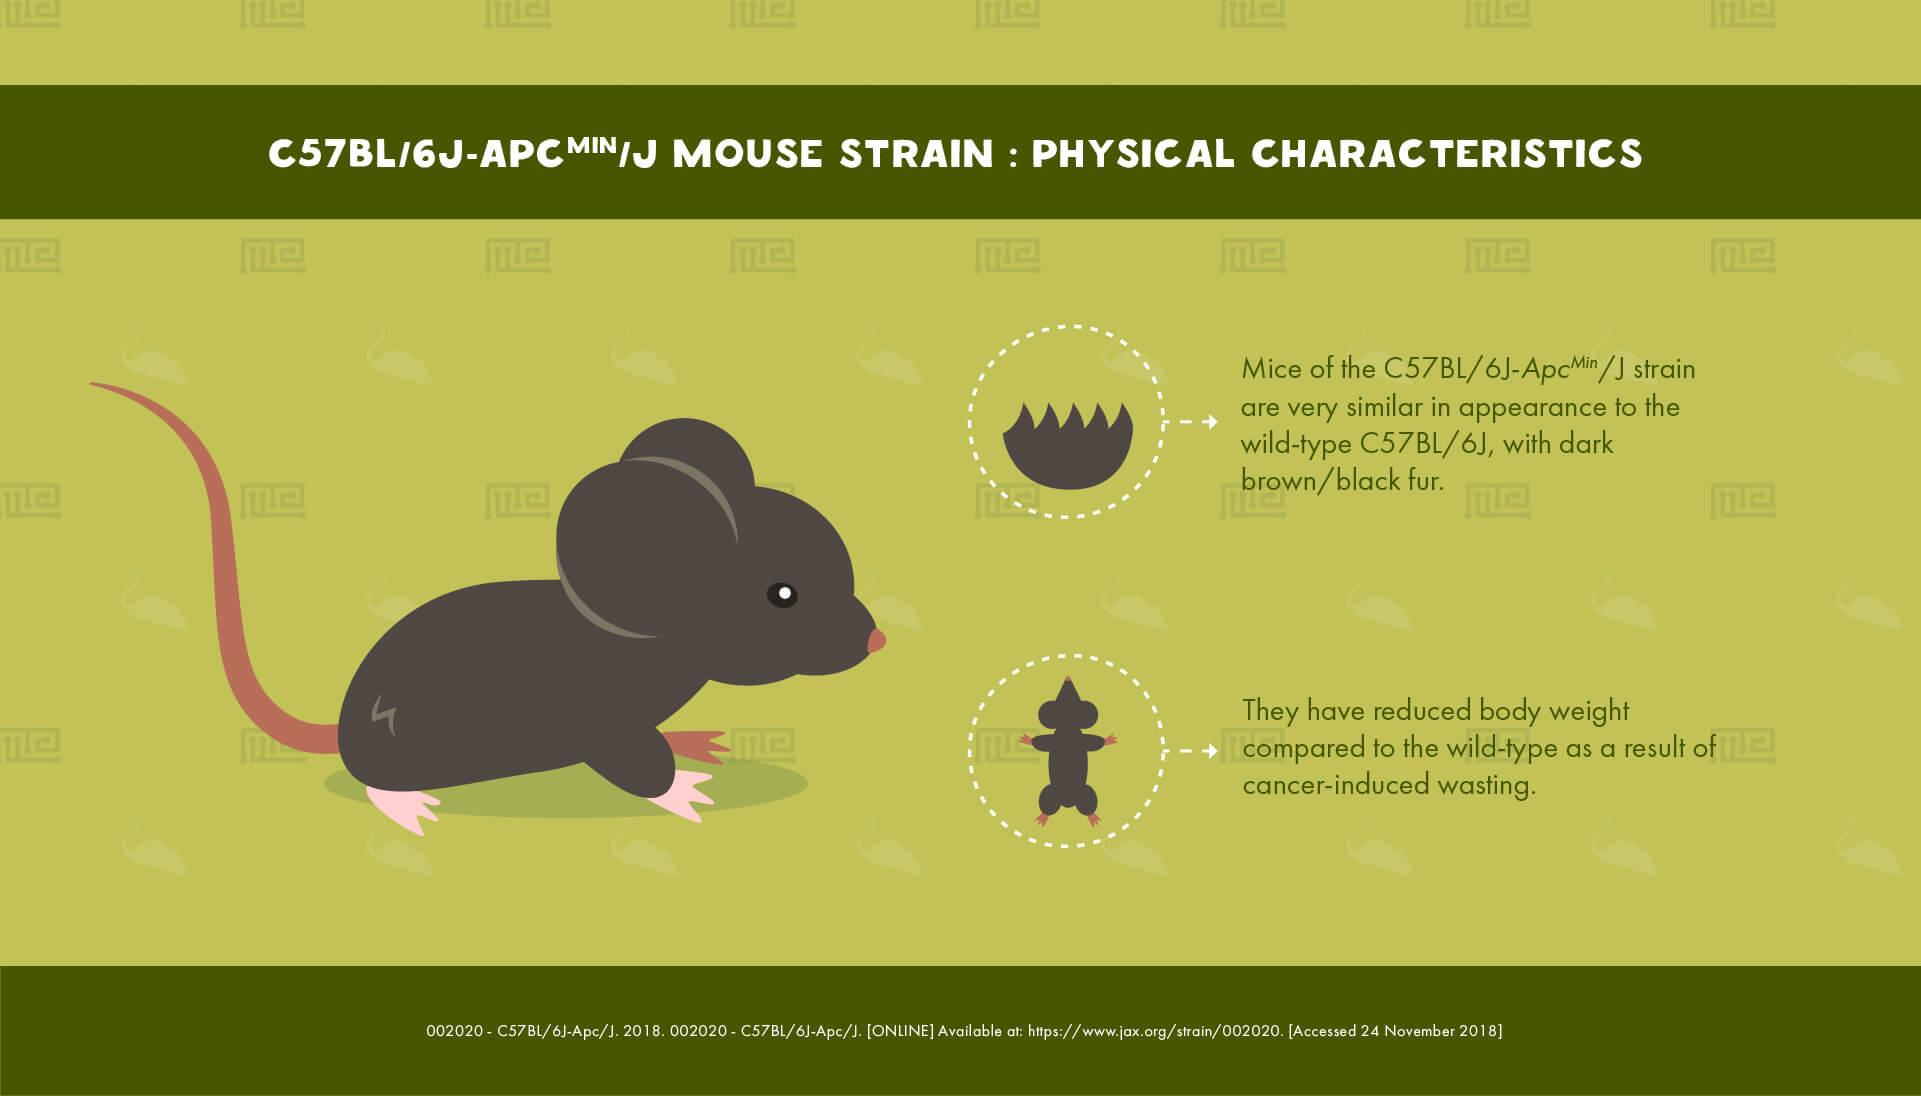 C57BL/6JApcMin/J Mouse Strain - Physical Characteristics